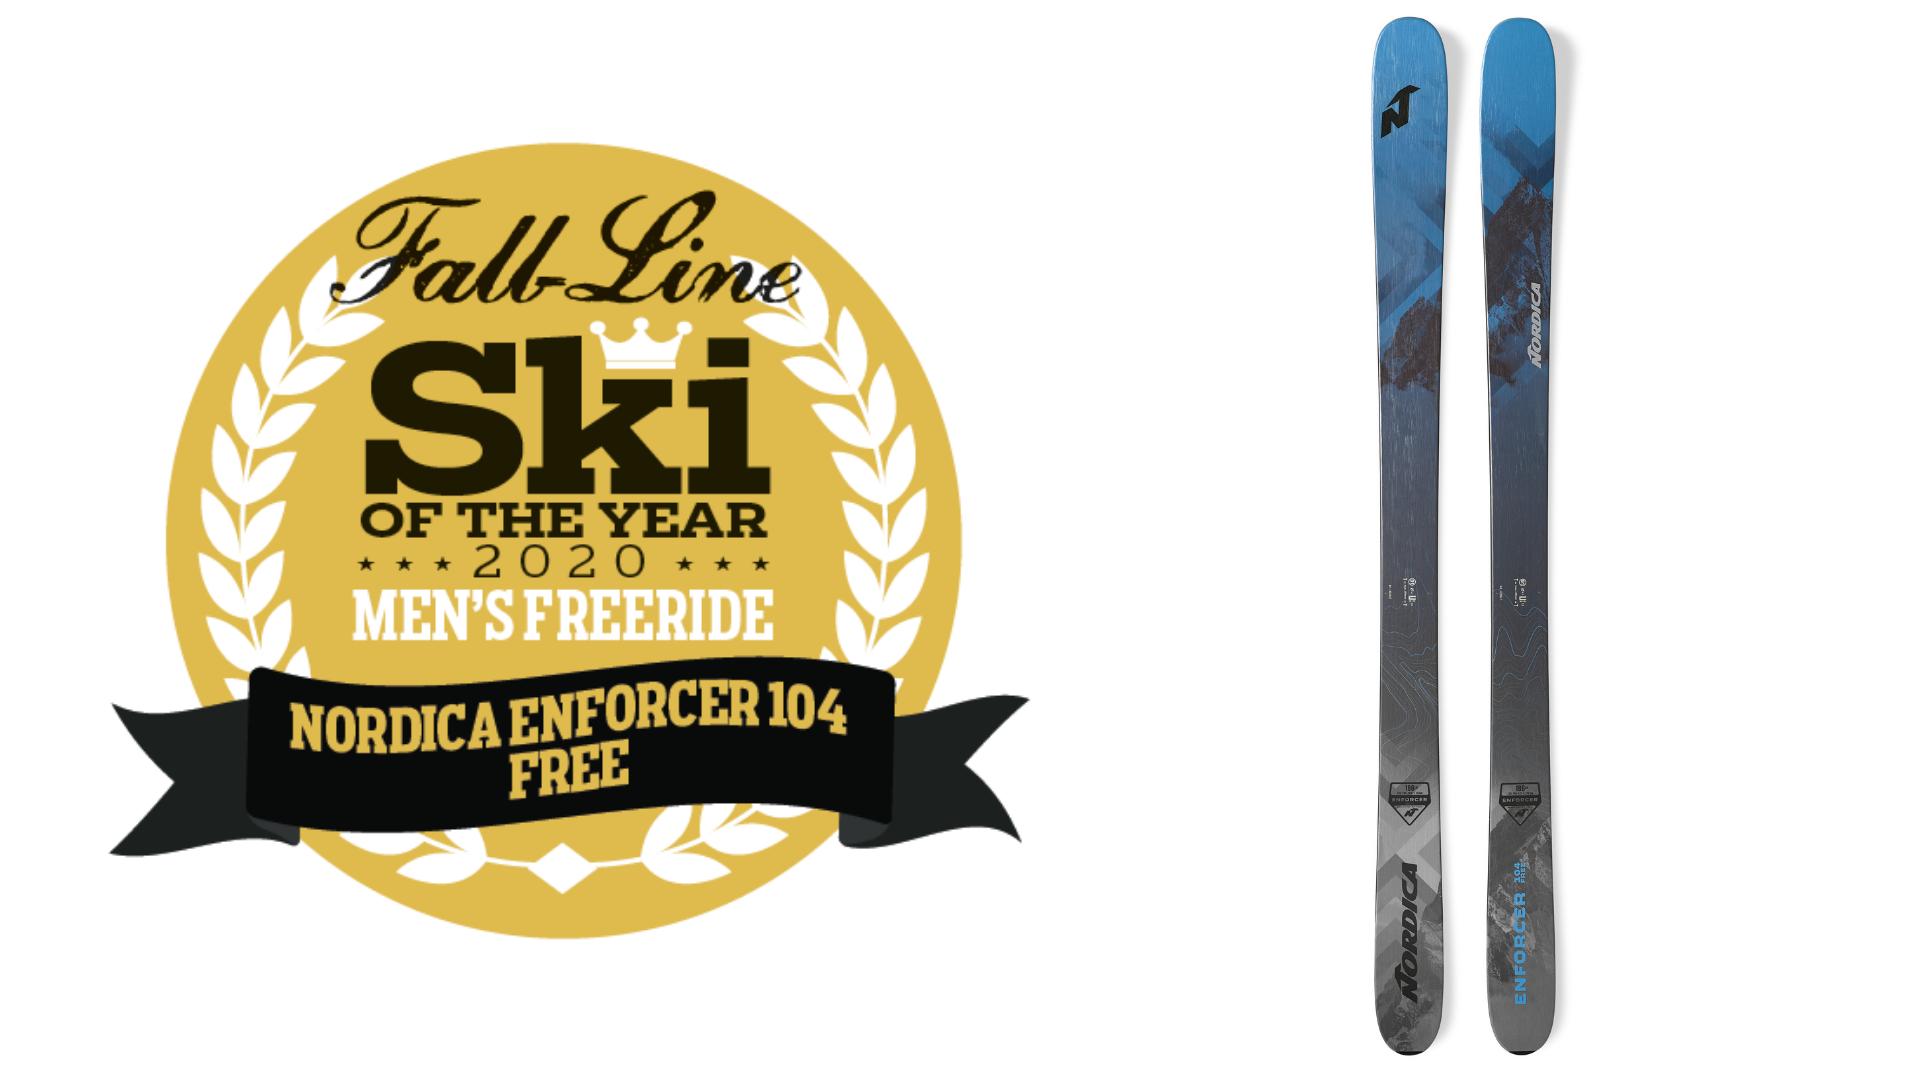 2020 Men S Freeride Ski Of The Year Nordica Enforcer Free 104 Fall Line Skiing